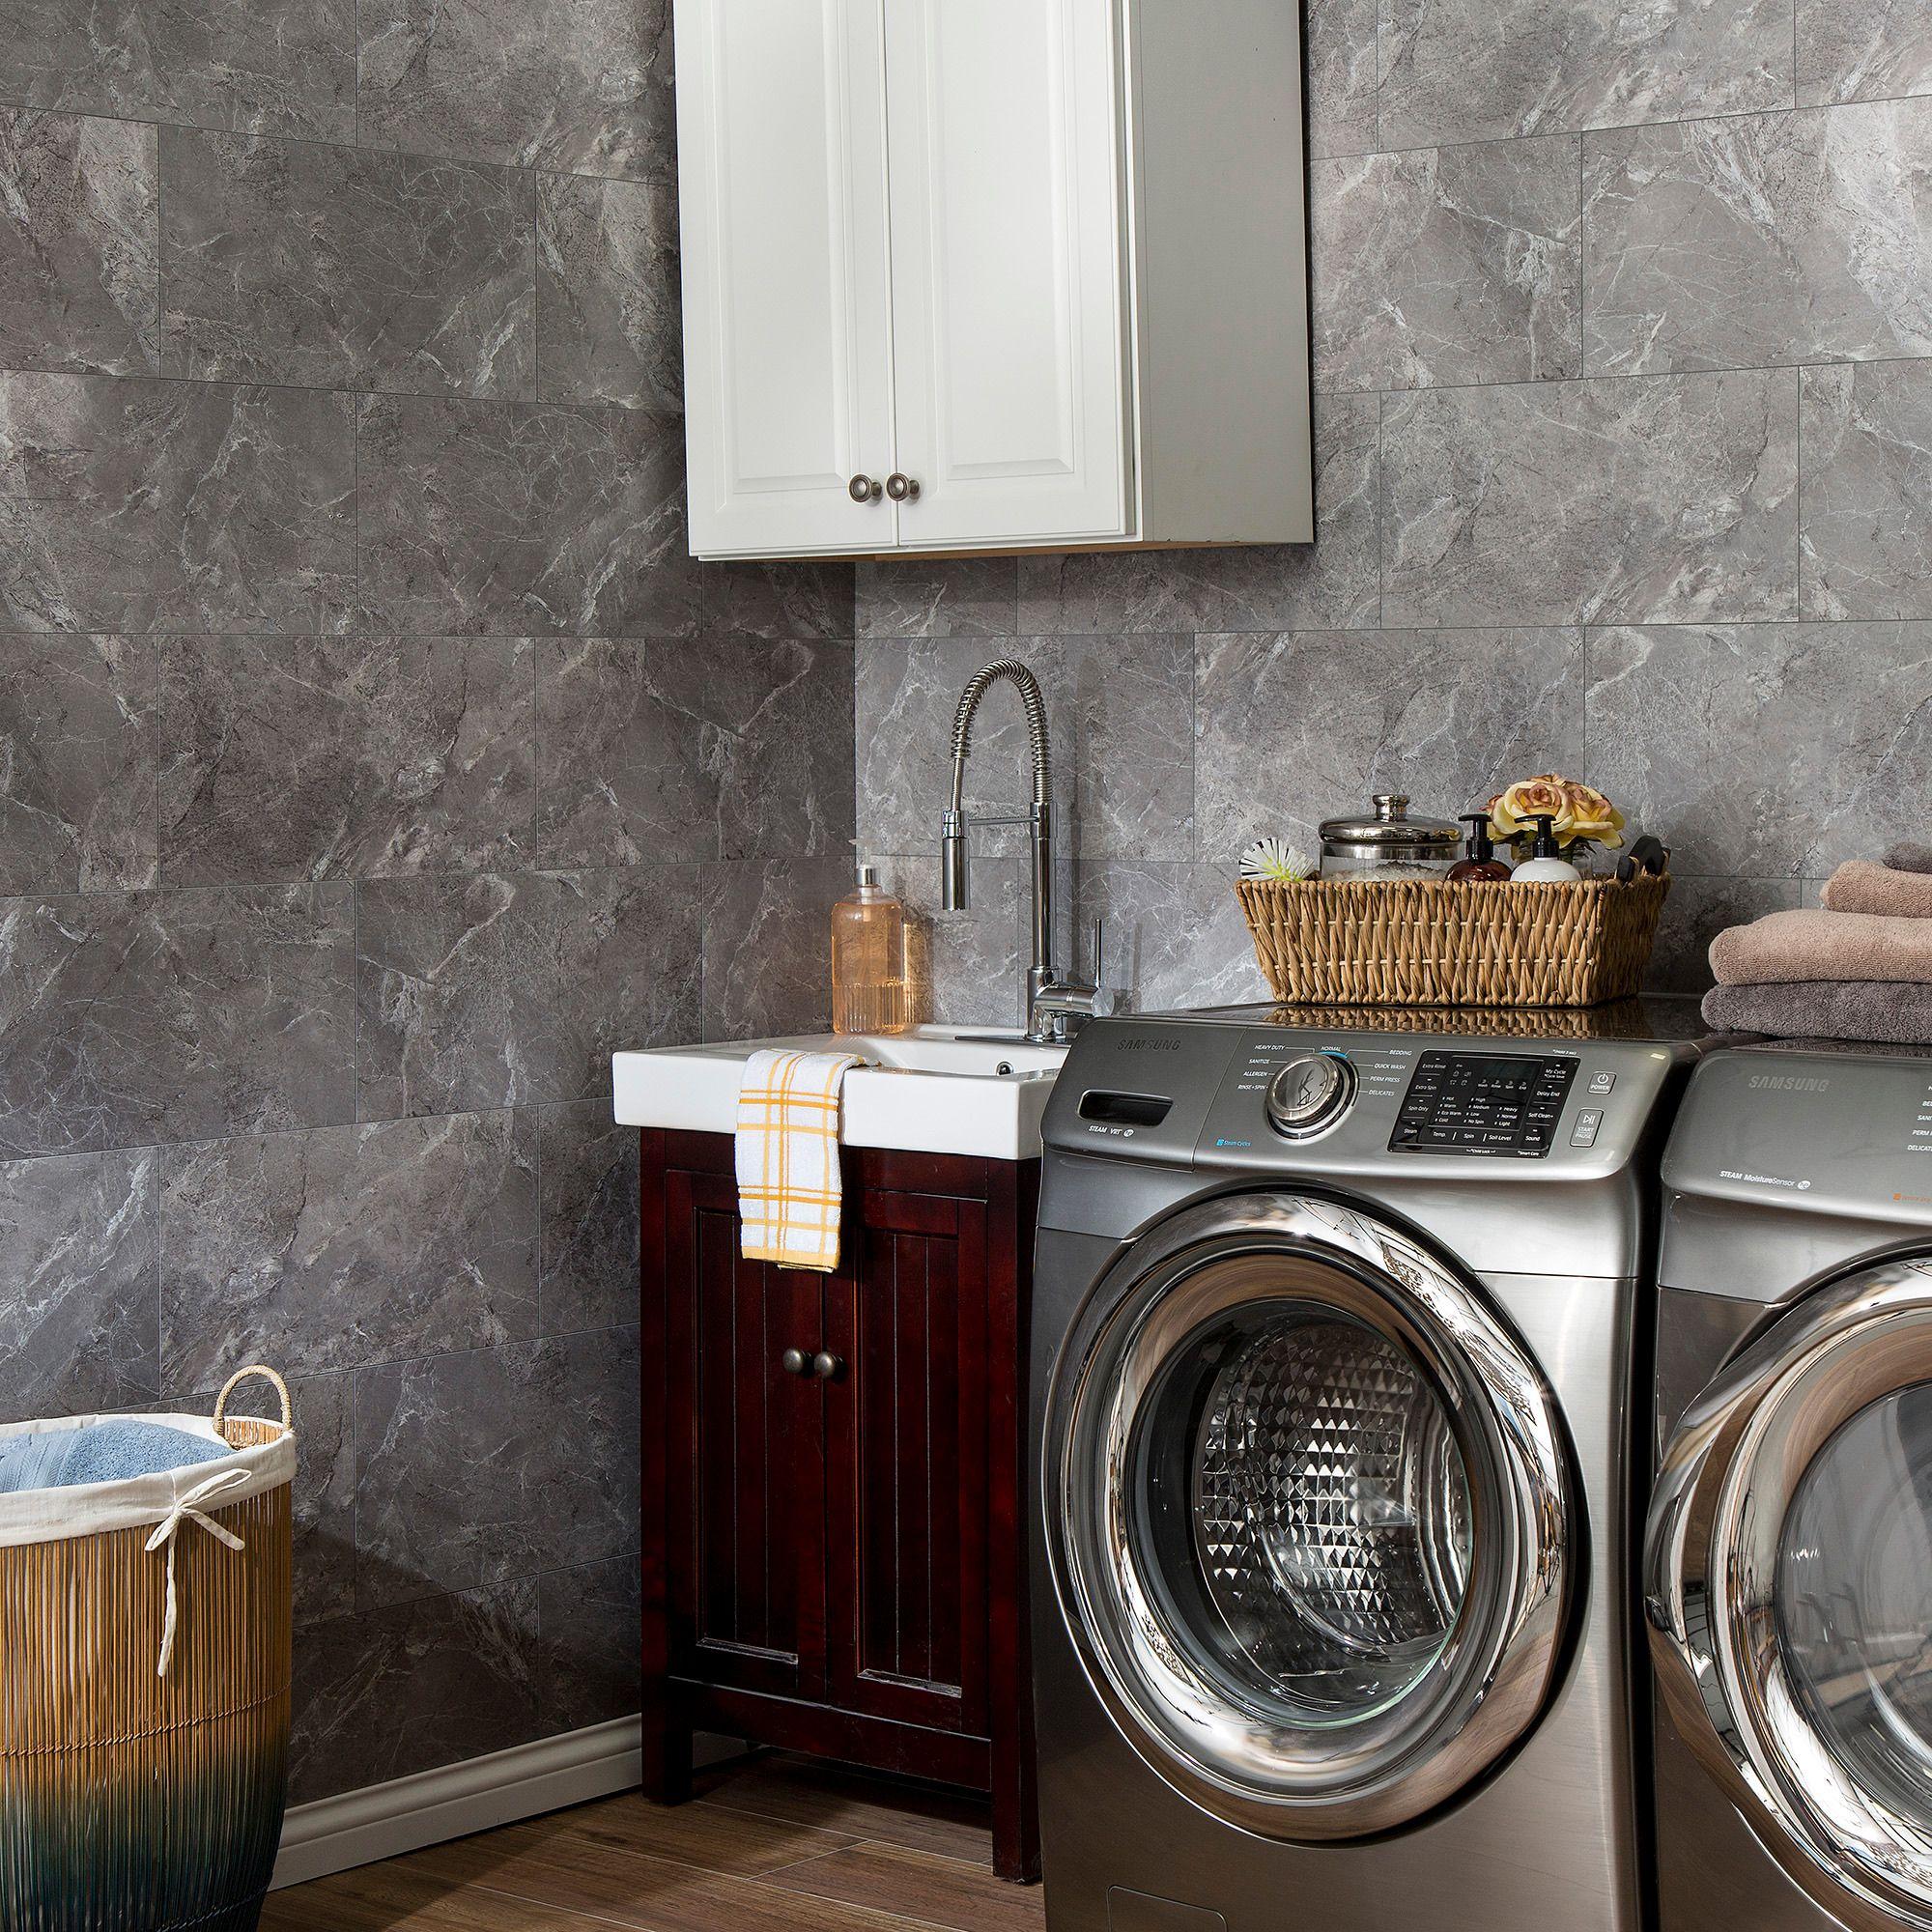 Dumawall Wall Panel In Light Gray Slate Slate Grey Tile Accent Wall Waterproof Wall Panels